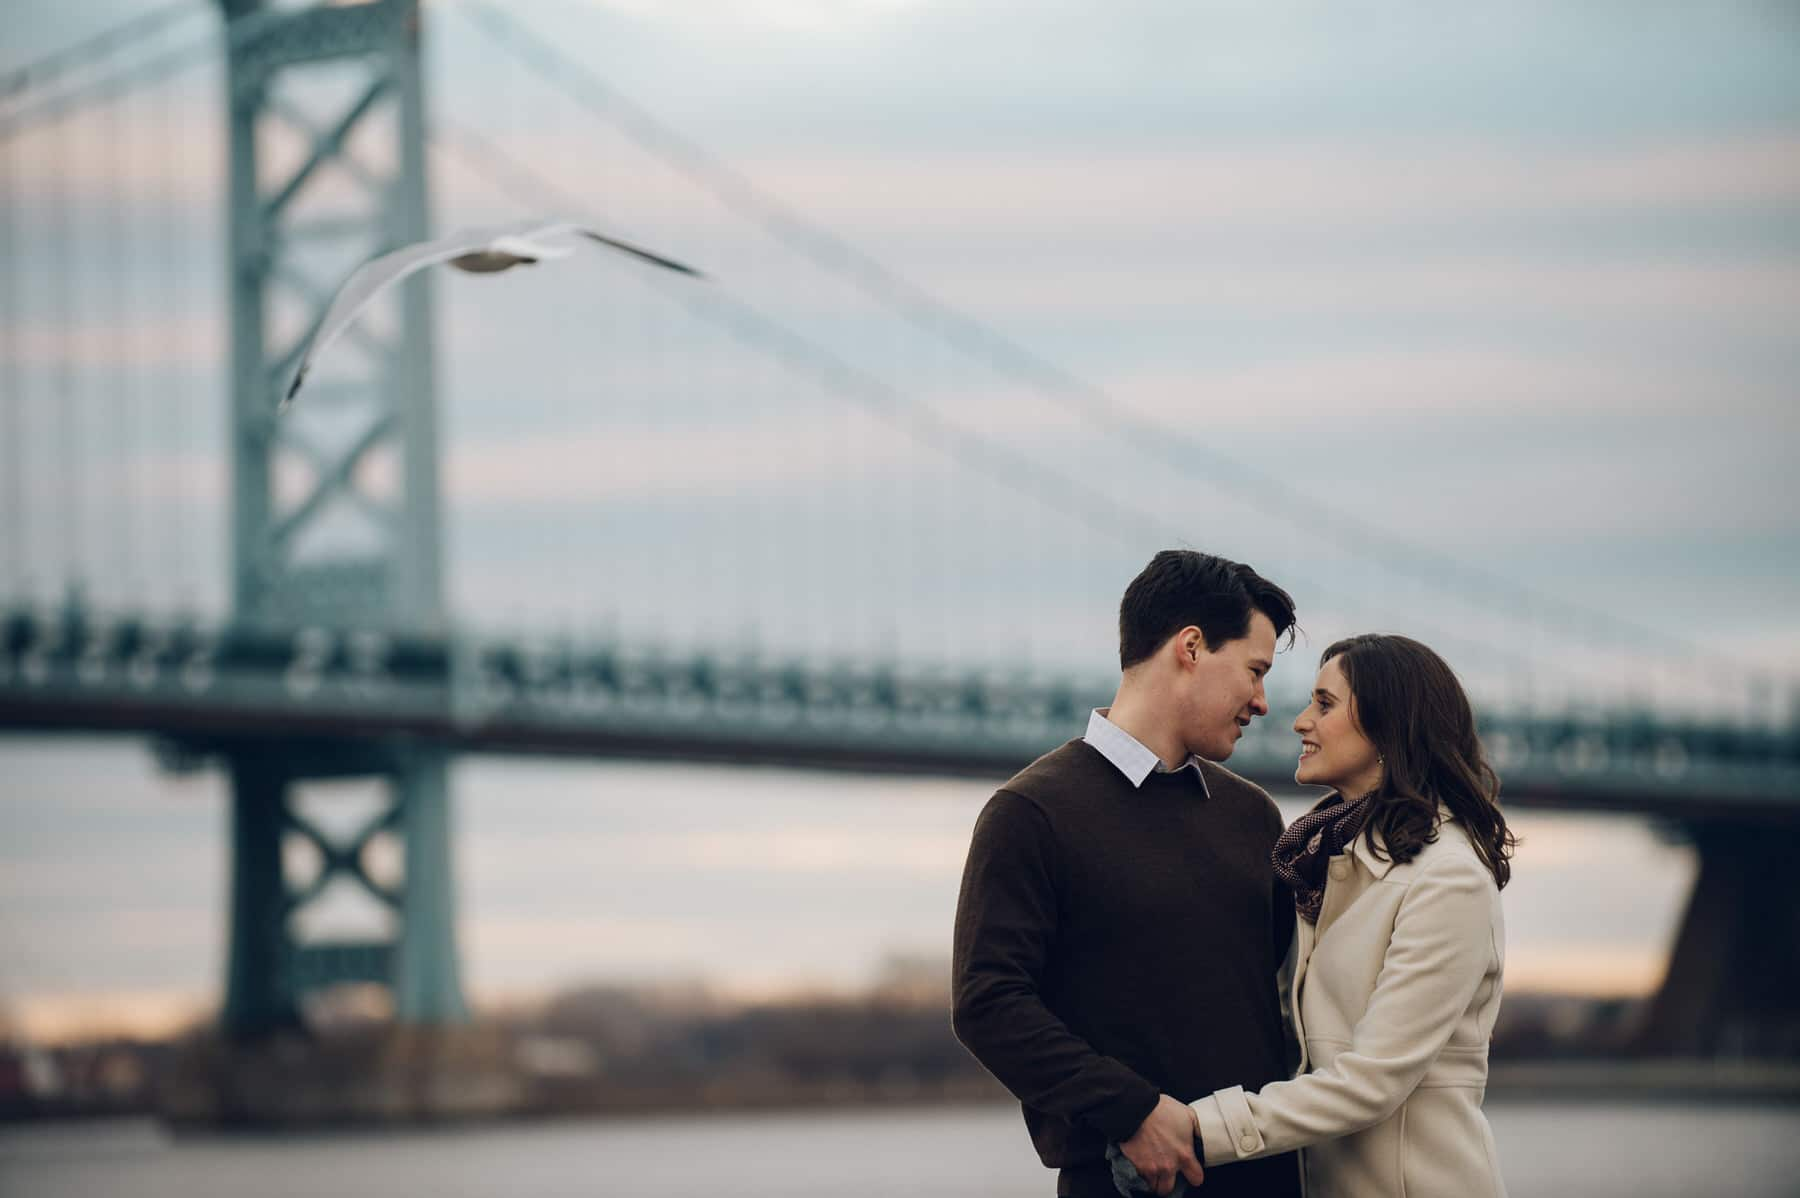 engagement photo with Ben Franklin Bridge